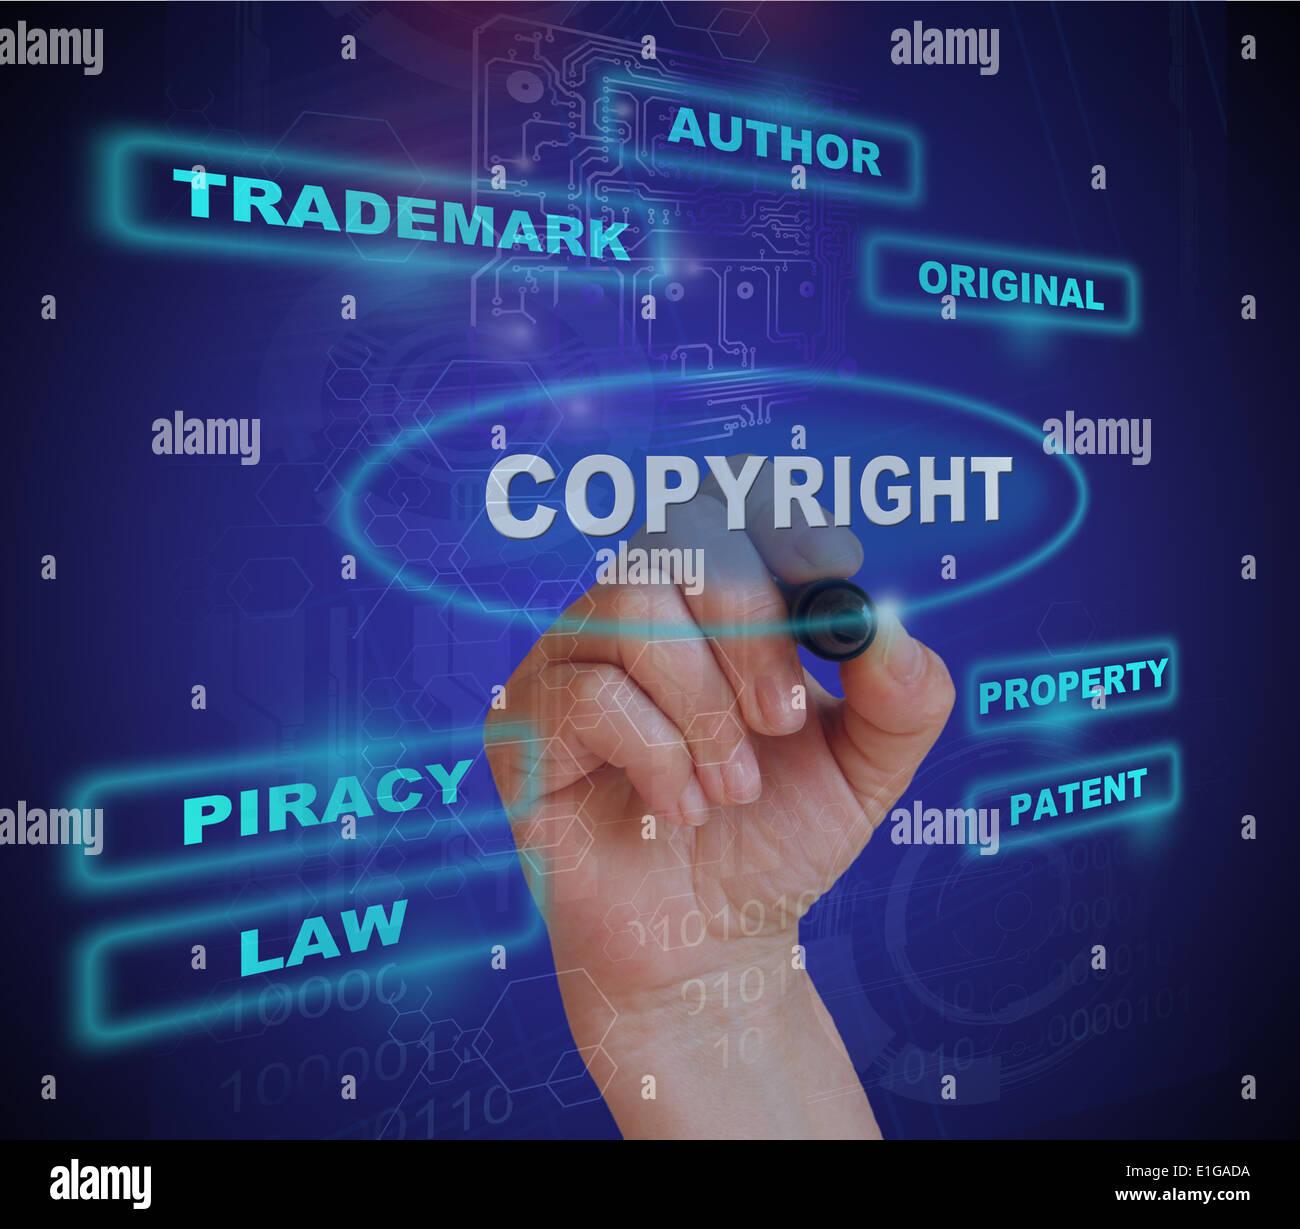 Escribir palabra copyright con marcador de fondo degradado realizado en 2d software Foto de stock